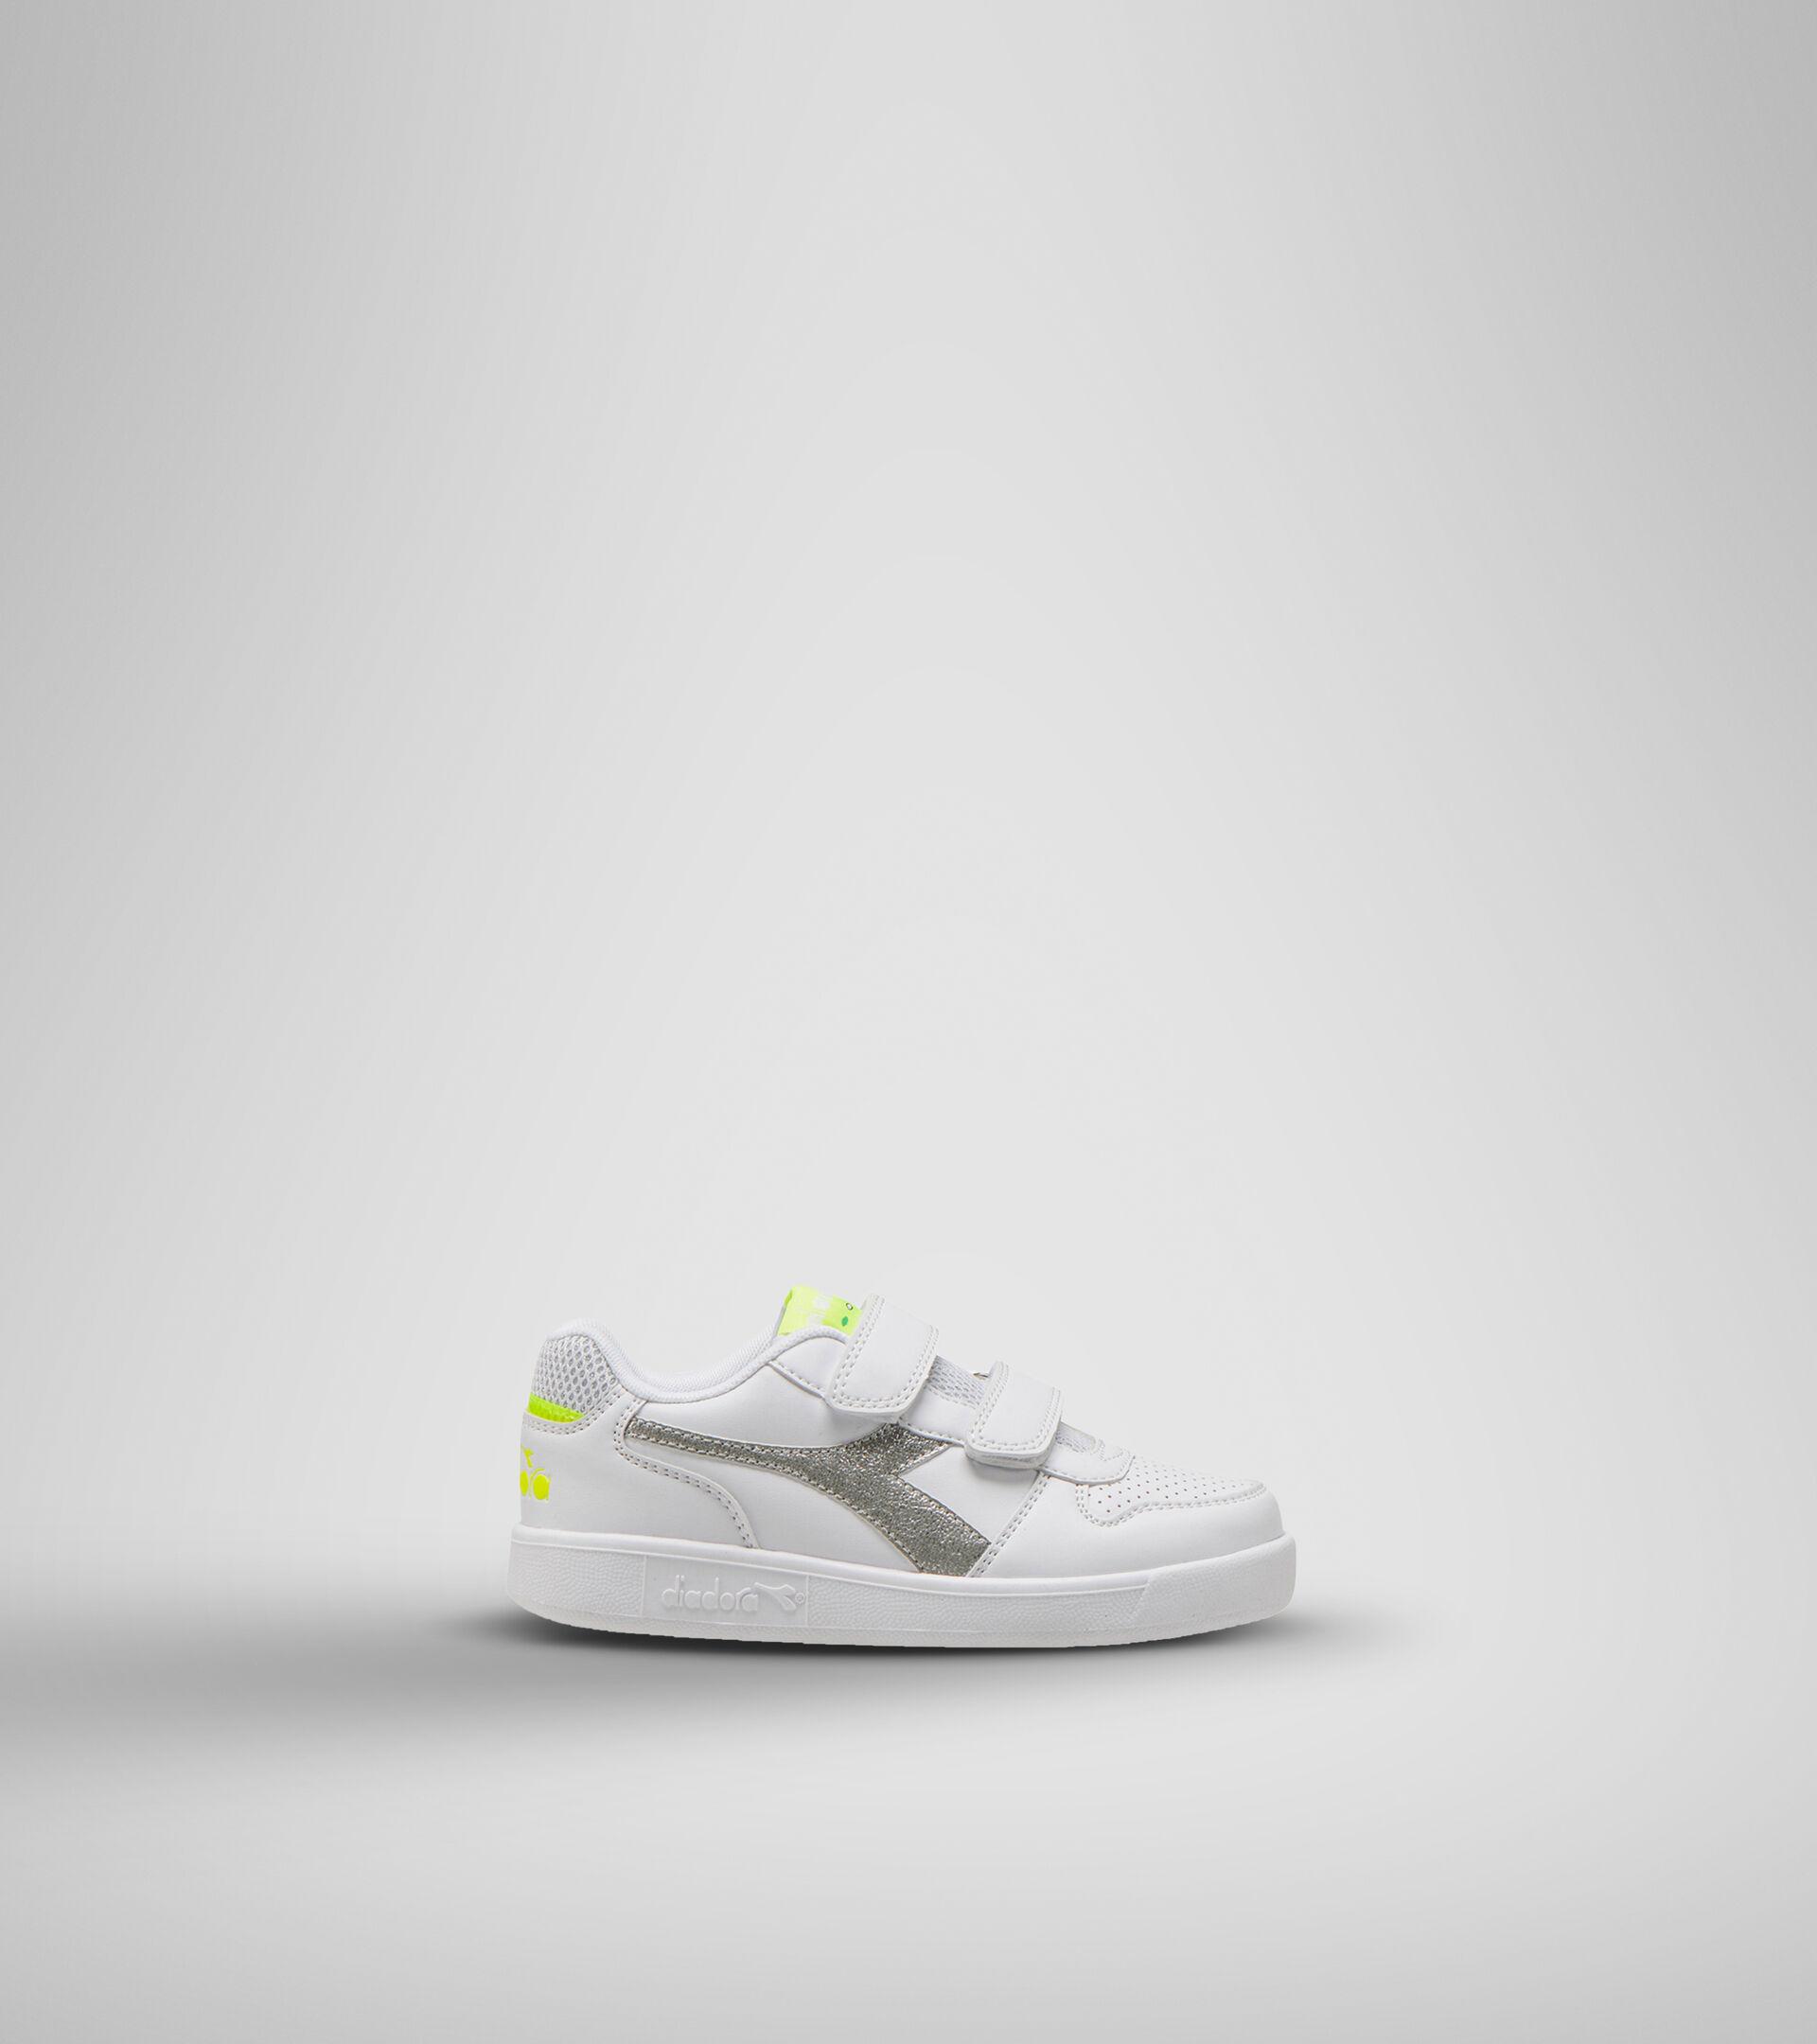 Footwear Sport BAMBINO PLAYGROUND PS GIRL WHITE/YELLOW FLUO. Diadora